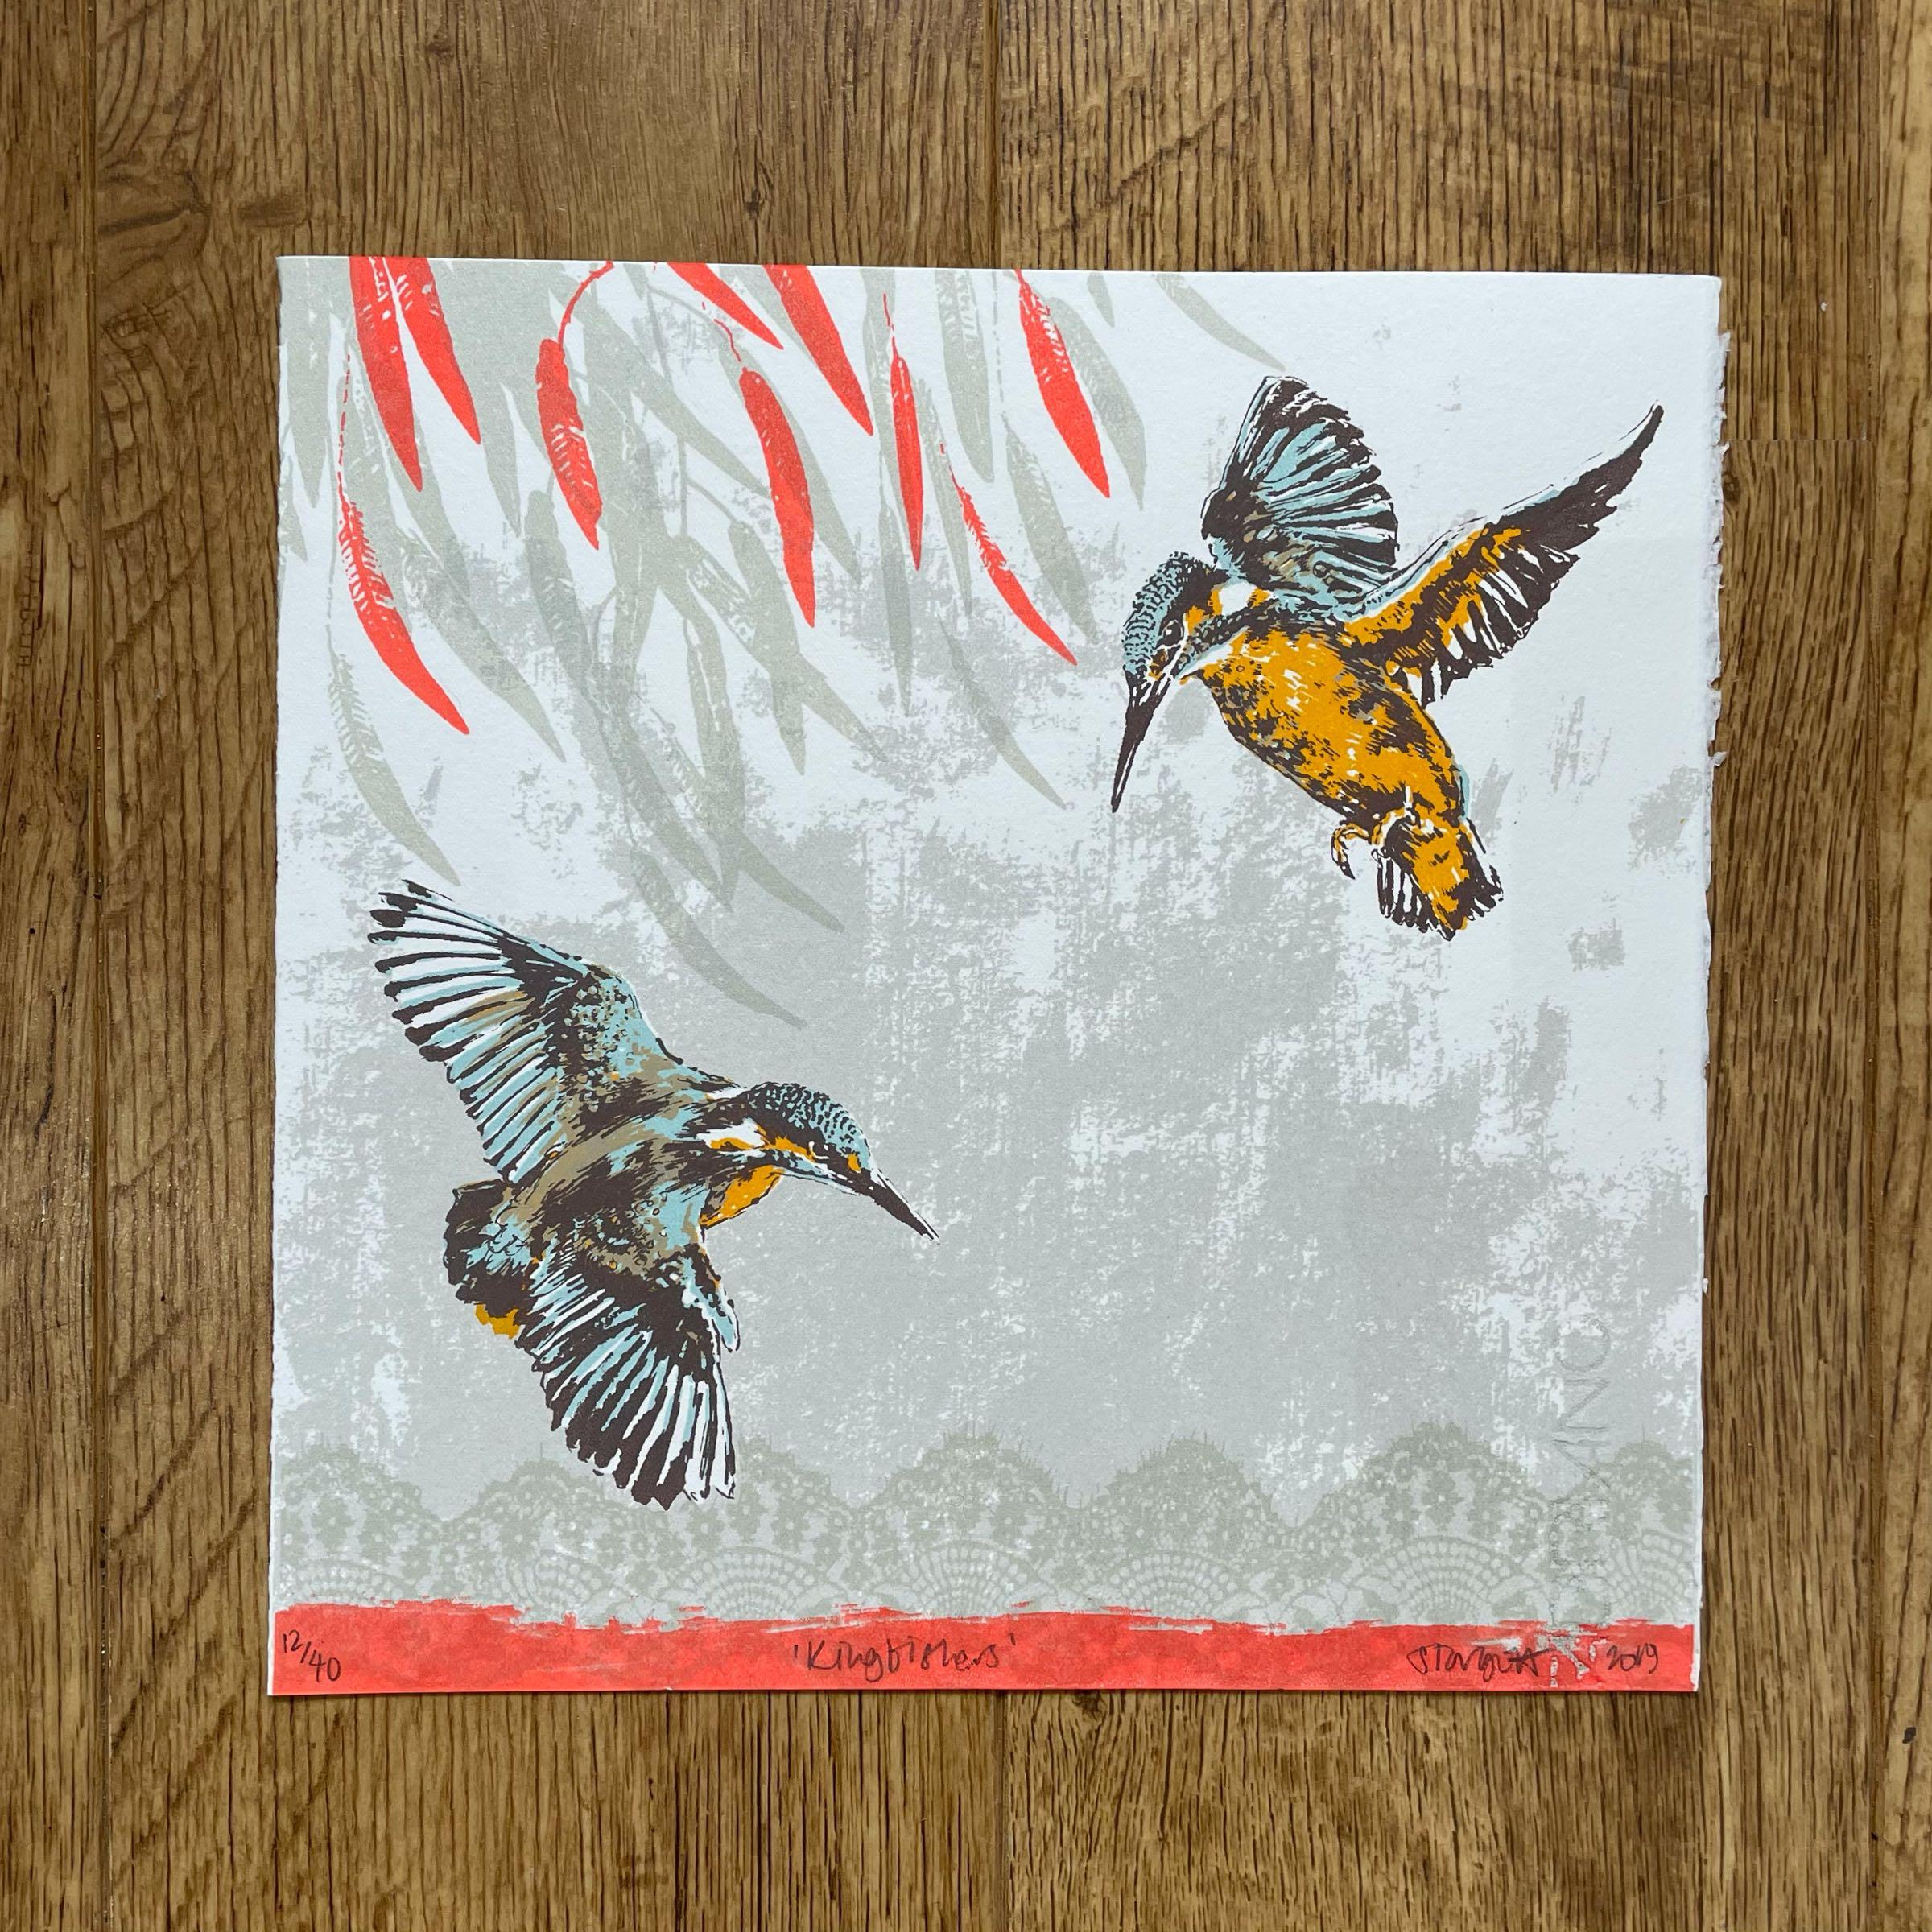 'Kingfishers' Silkscreen print by Sarah Targett